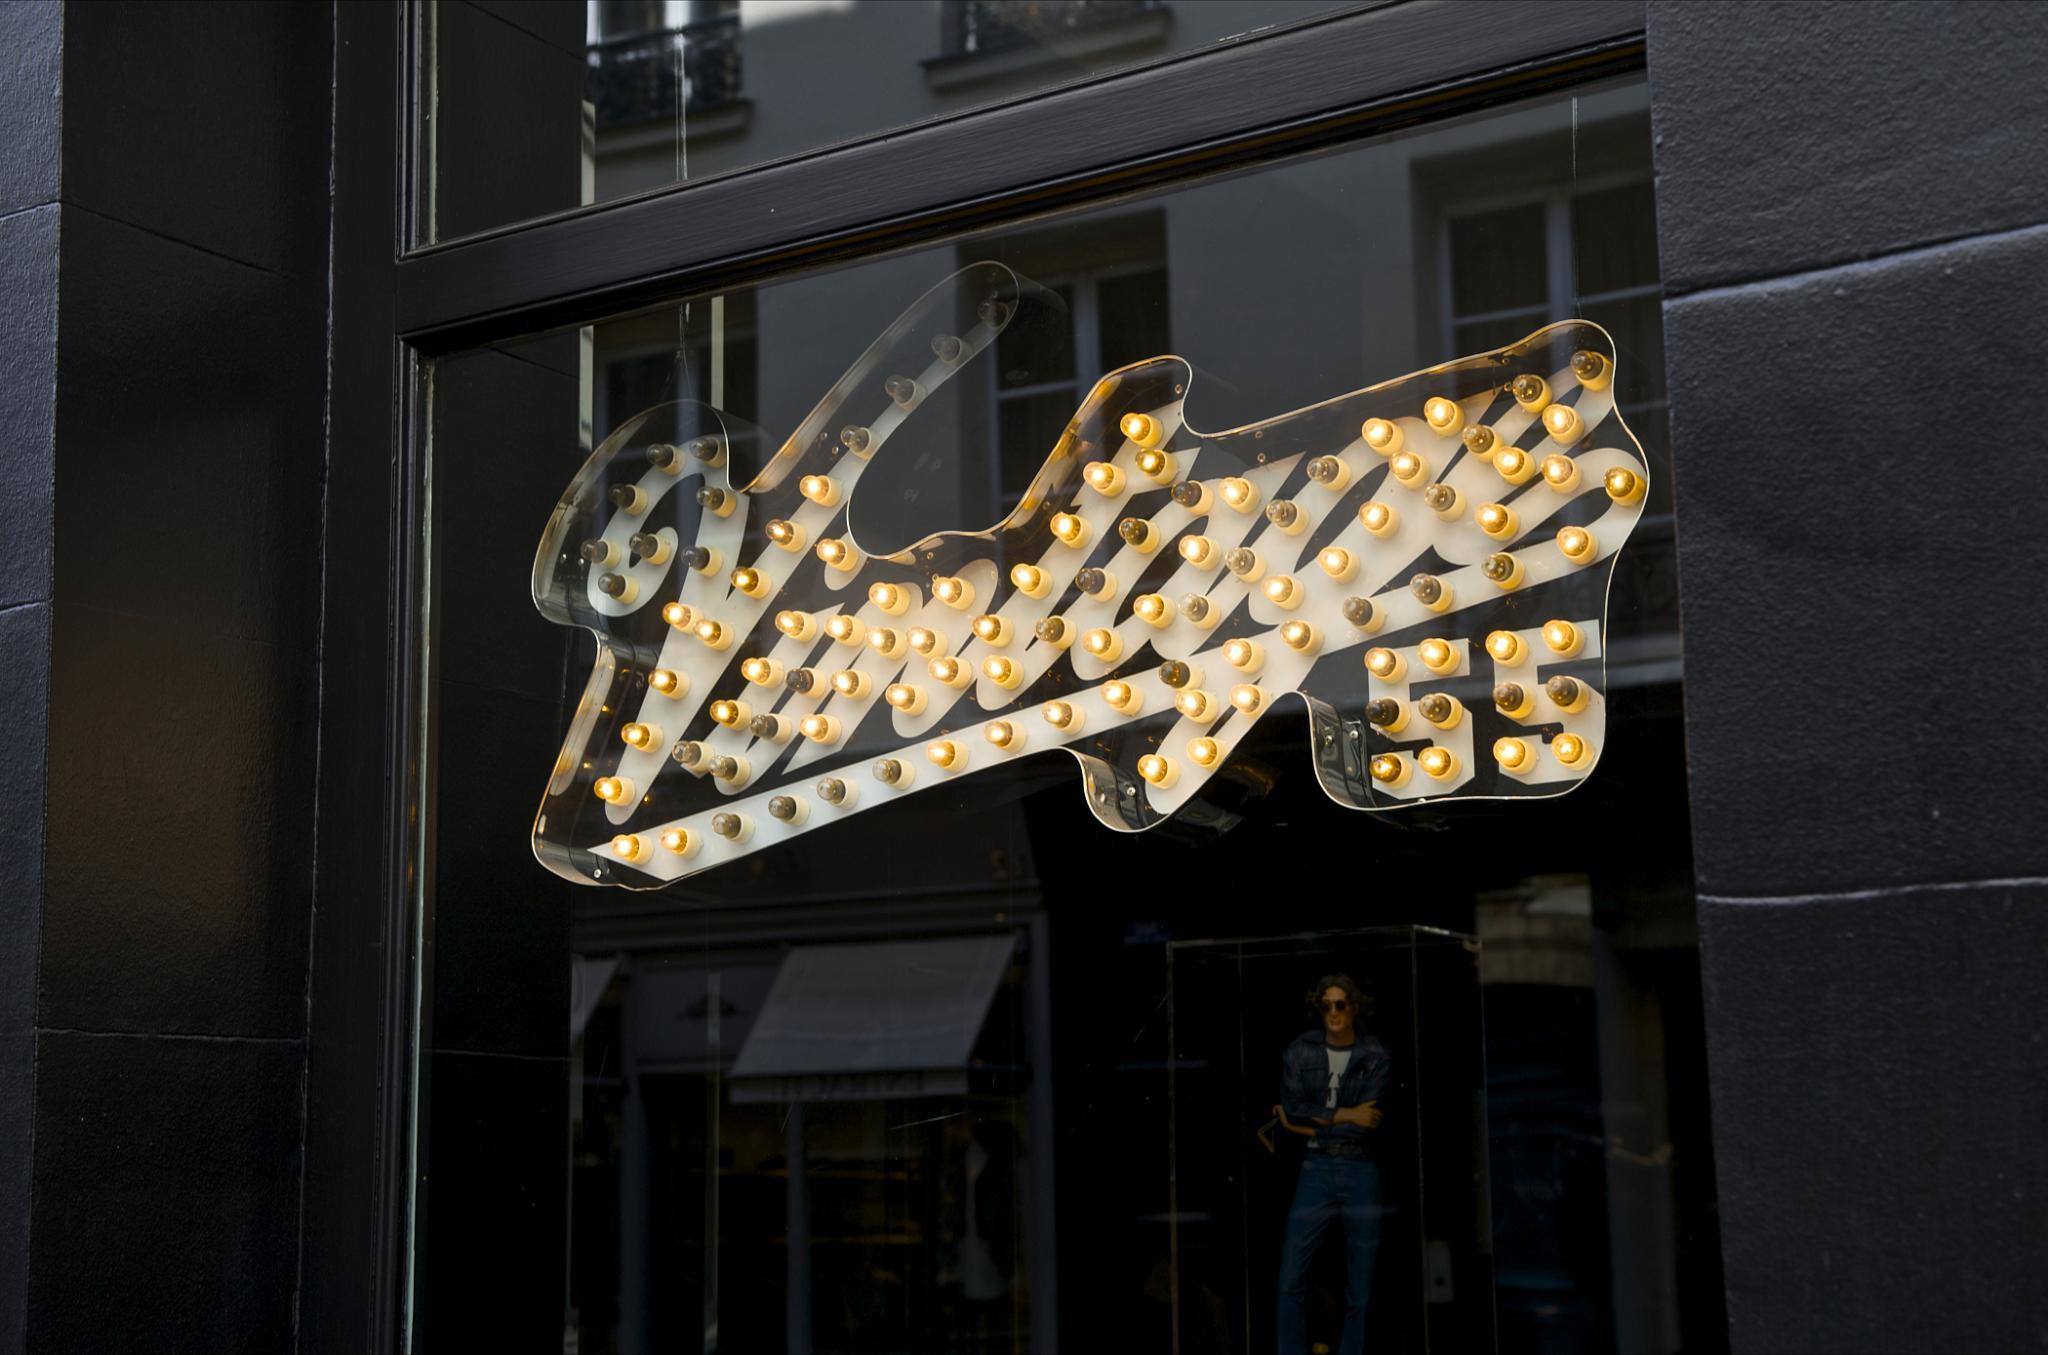 23 Rue Du Cherche Midi file:paris rue du cherche-midi no 015 - shop window vintage